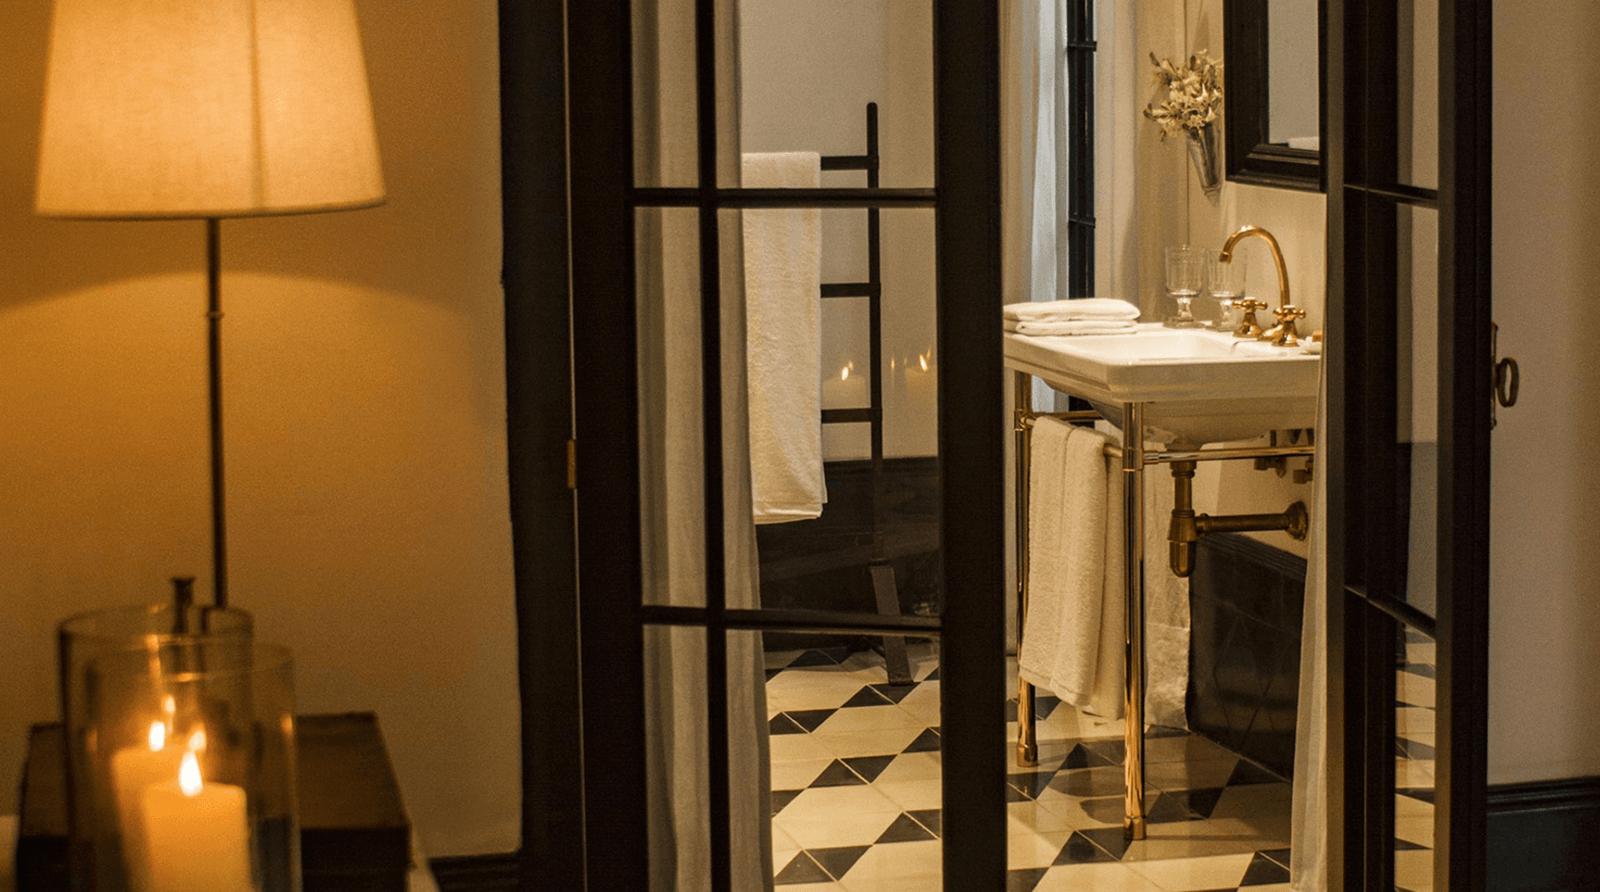 loma_del_angel_suite_bedroom_bathroom_view_compressed.jpg